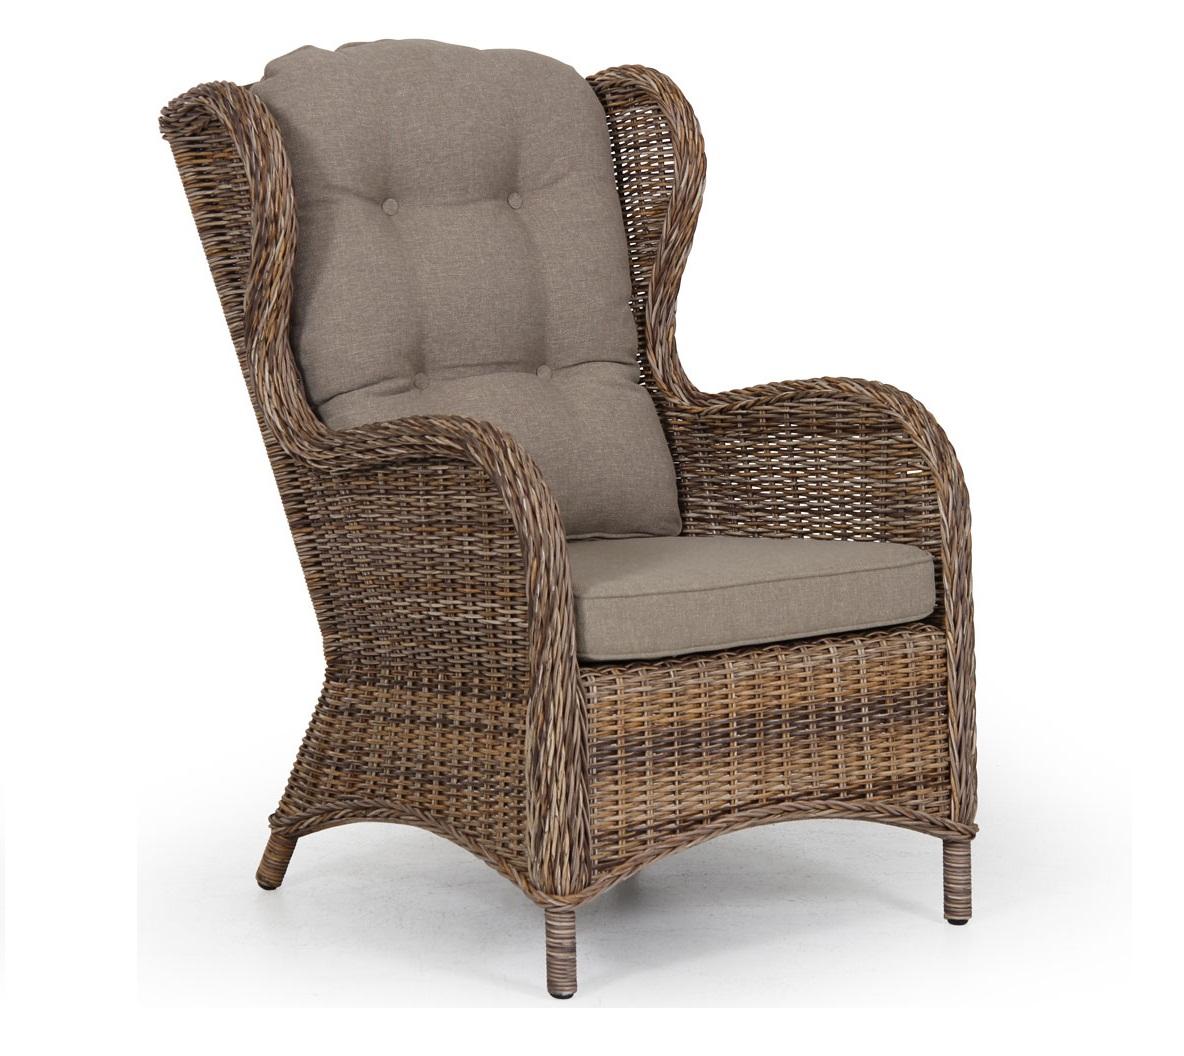 Плетеное кресло Evita brown фото